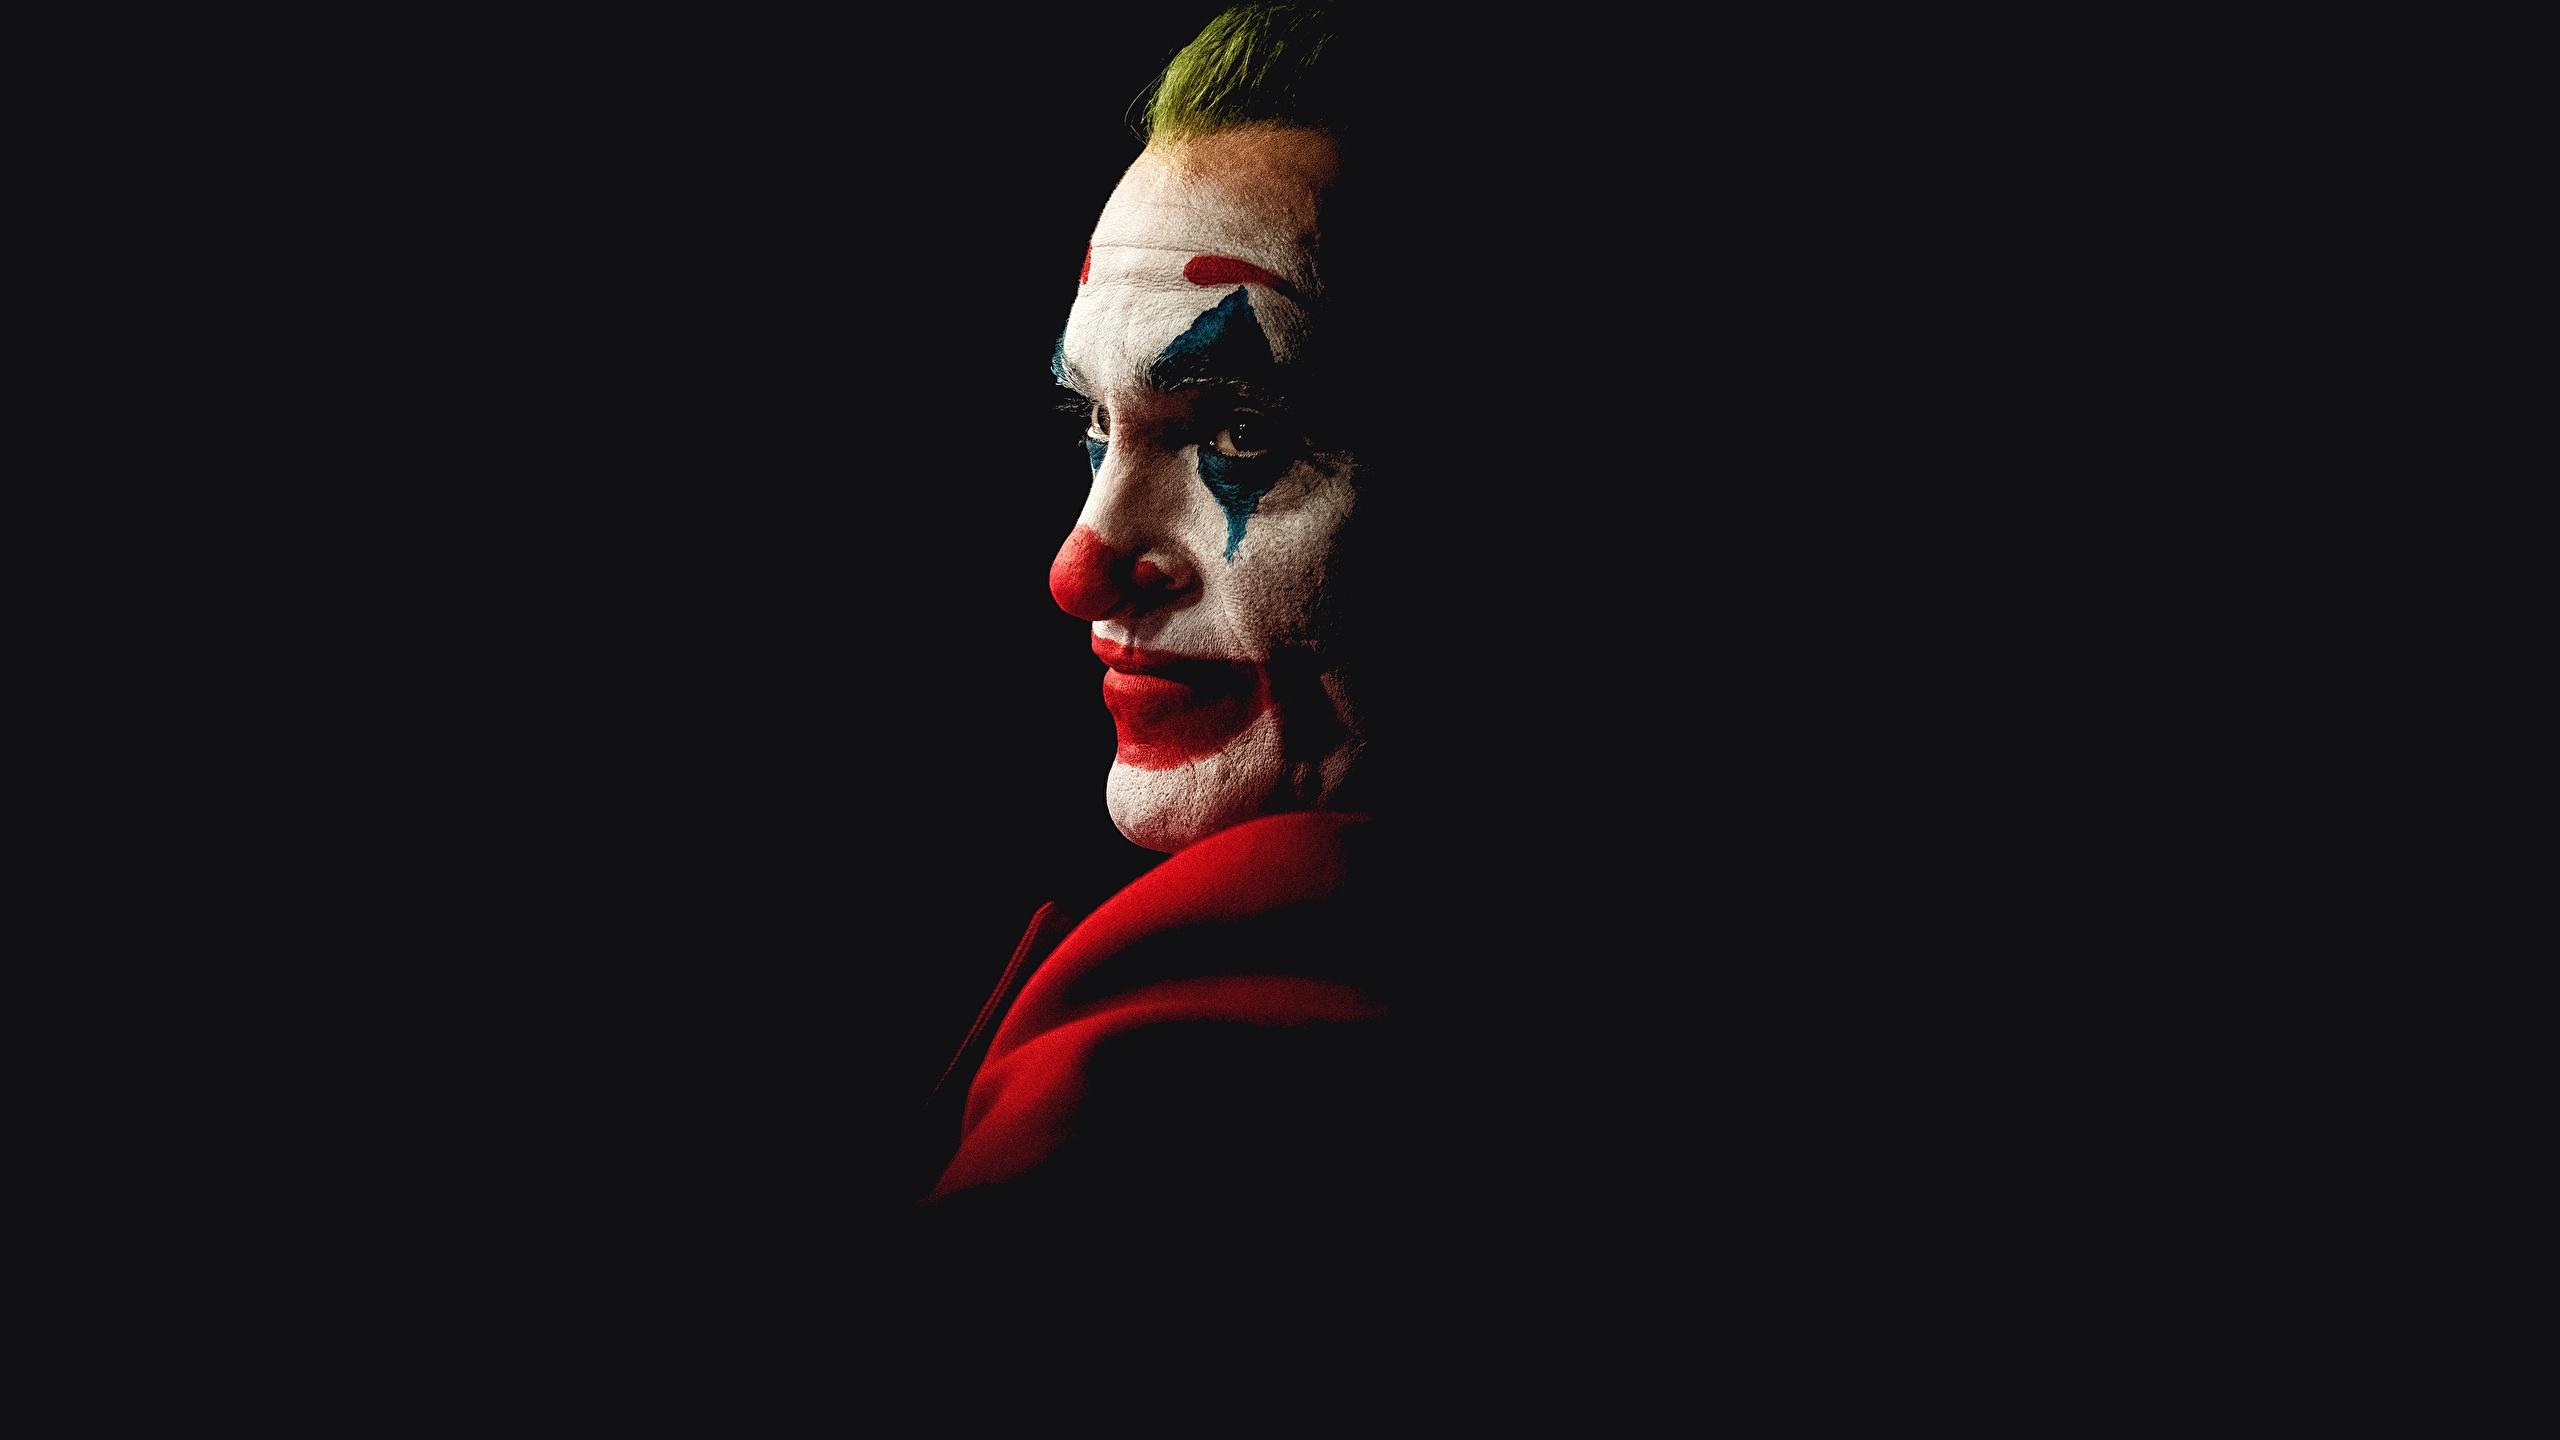 Fonds Decran 2560x1440 Joker Héros Joker 2019 Joaquin